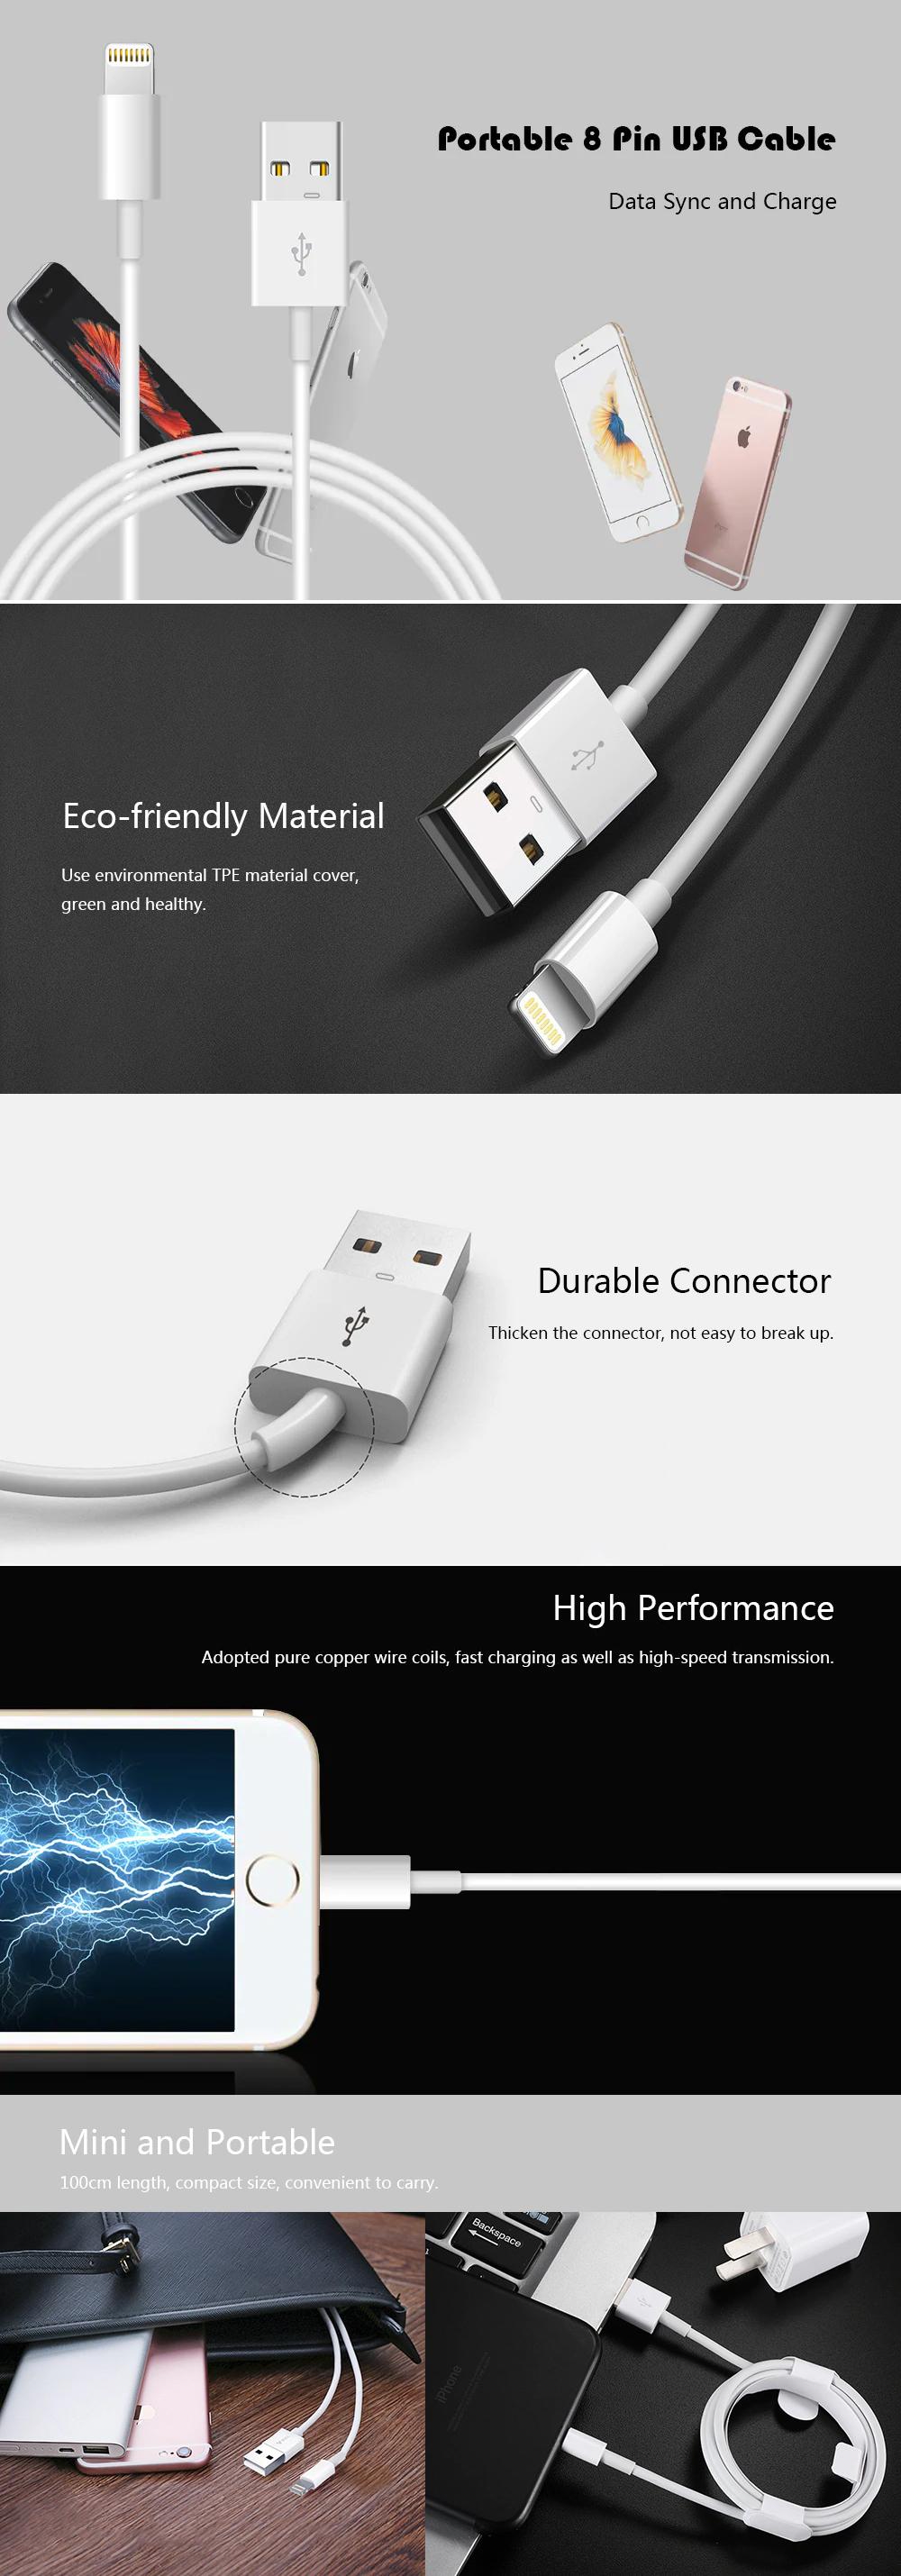 Cable de 2A 8 pin de carga y datos USB para iPhone / iPad / iPod - 100 cm